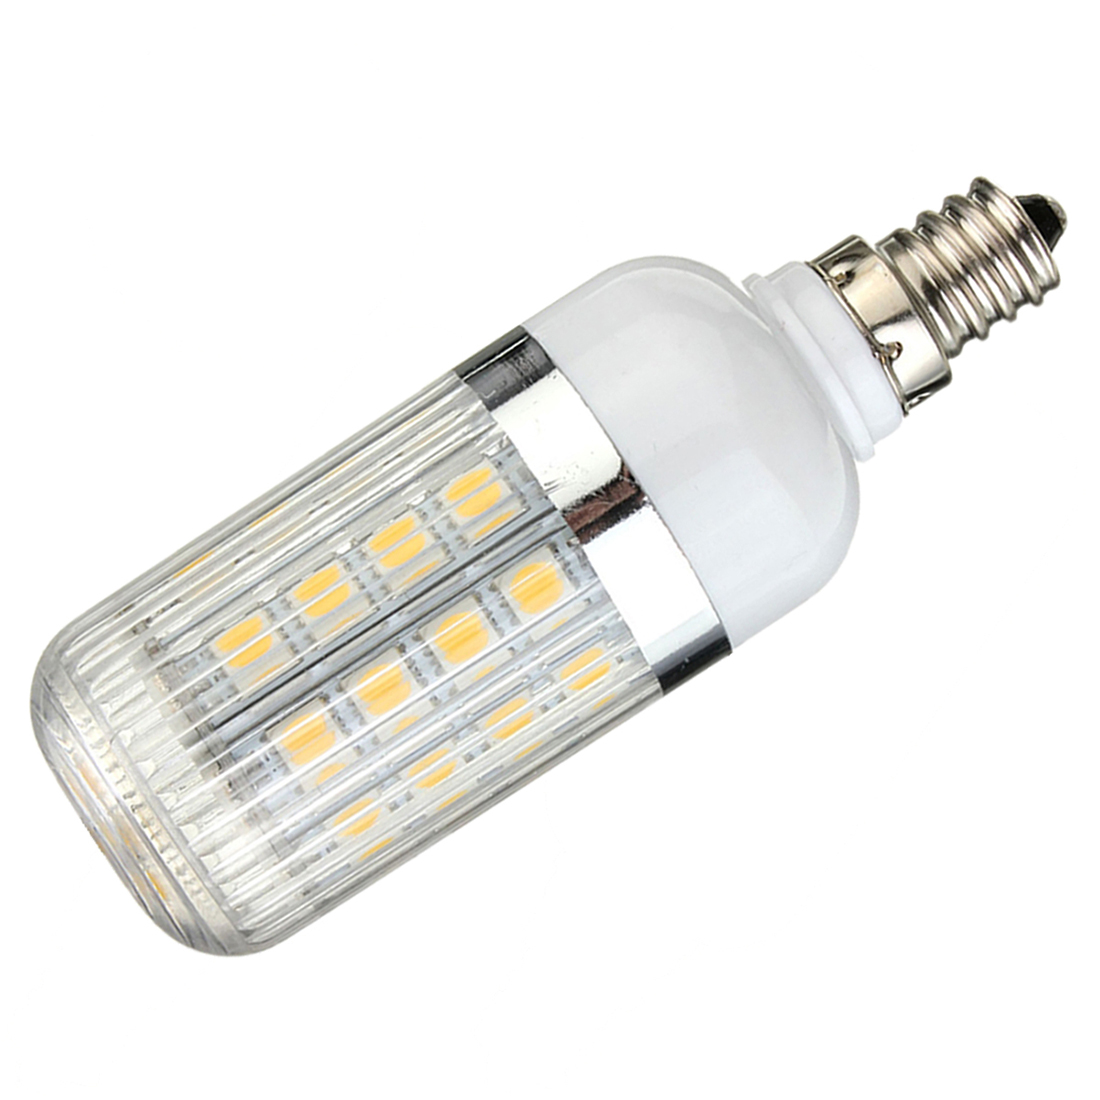 E12 5W Dimmable 36 SMD 5050 LED Corn Light Bulb Lamp Color Temperature:Warm White(3000-3500K) Amount:10 Pcs new corn bulb e27 9 11 12 14w 220v pure warm white smd 5050 44 52 60 64 led spot light bulb lamp flat tube